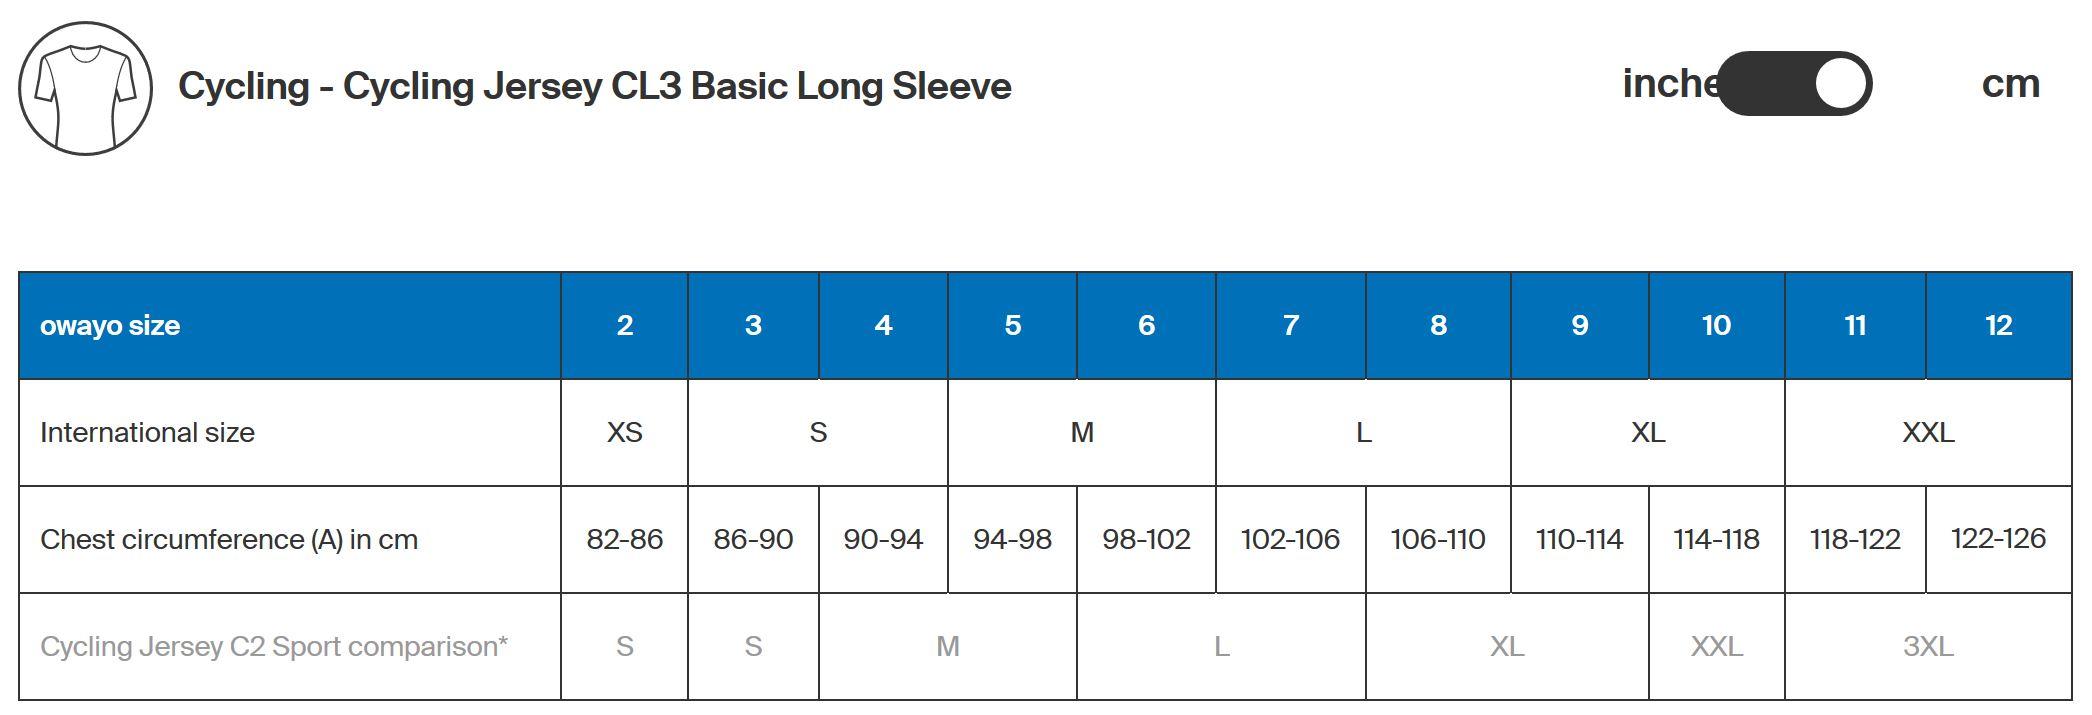 Owayo Size Guide